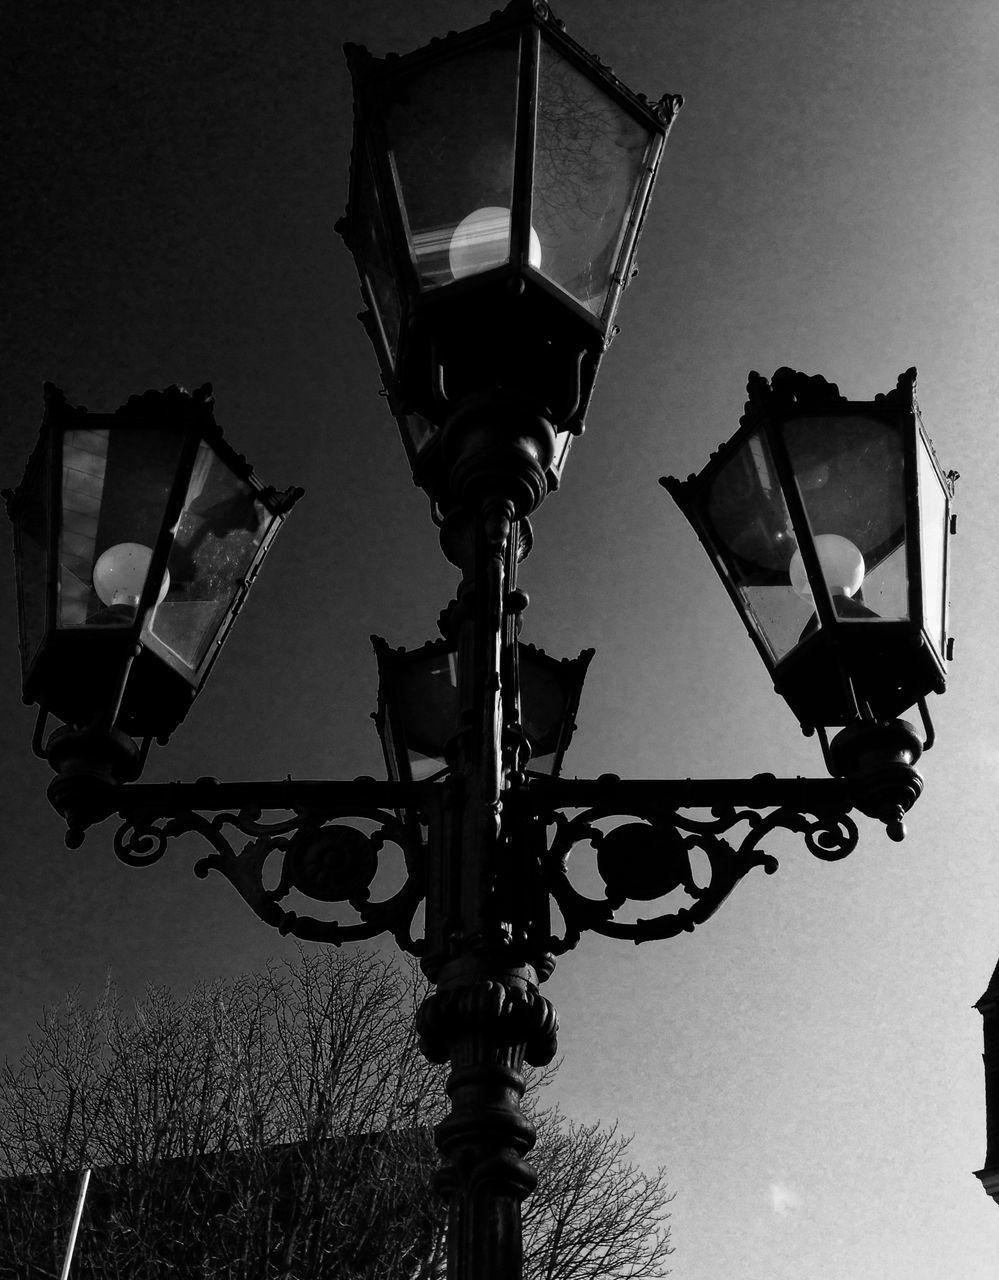 lighting equipment, street light, illuminated, low angle view, gas light, electric light, electric lamp, street lamp, no people, outdoors, electricity, night, technology, sky, close-up